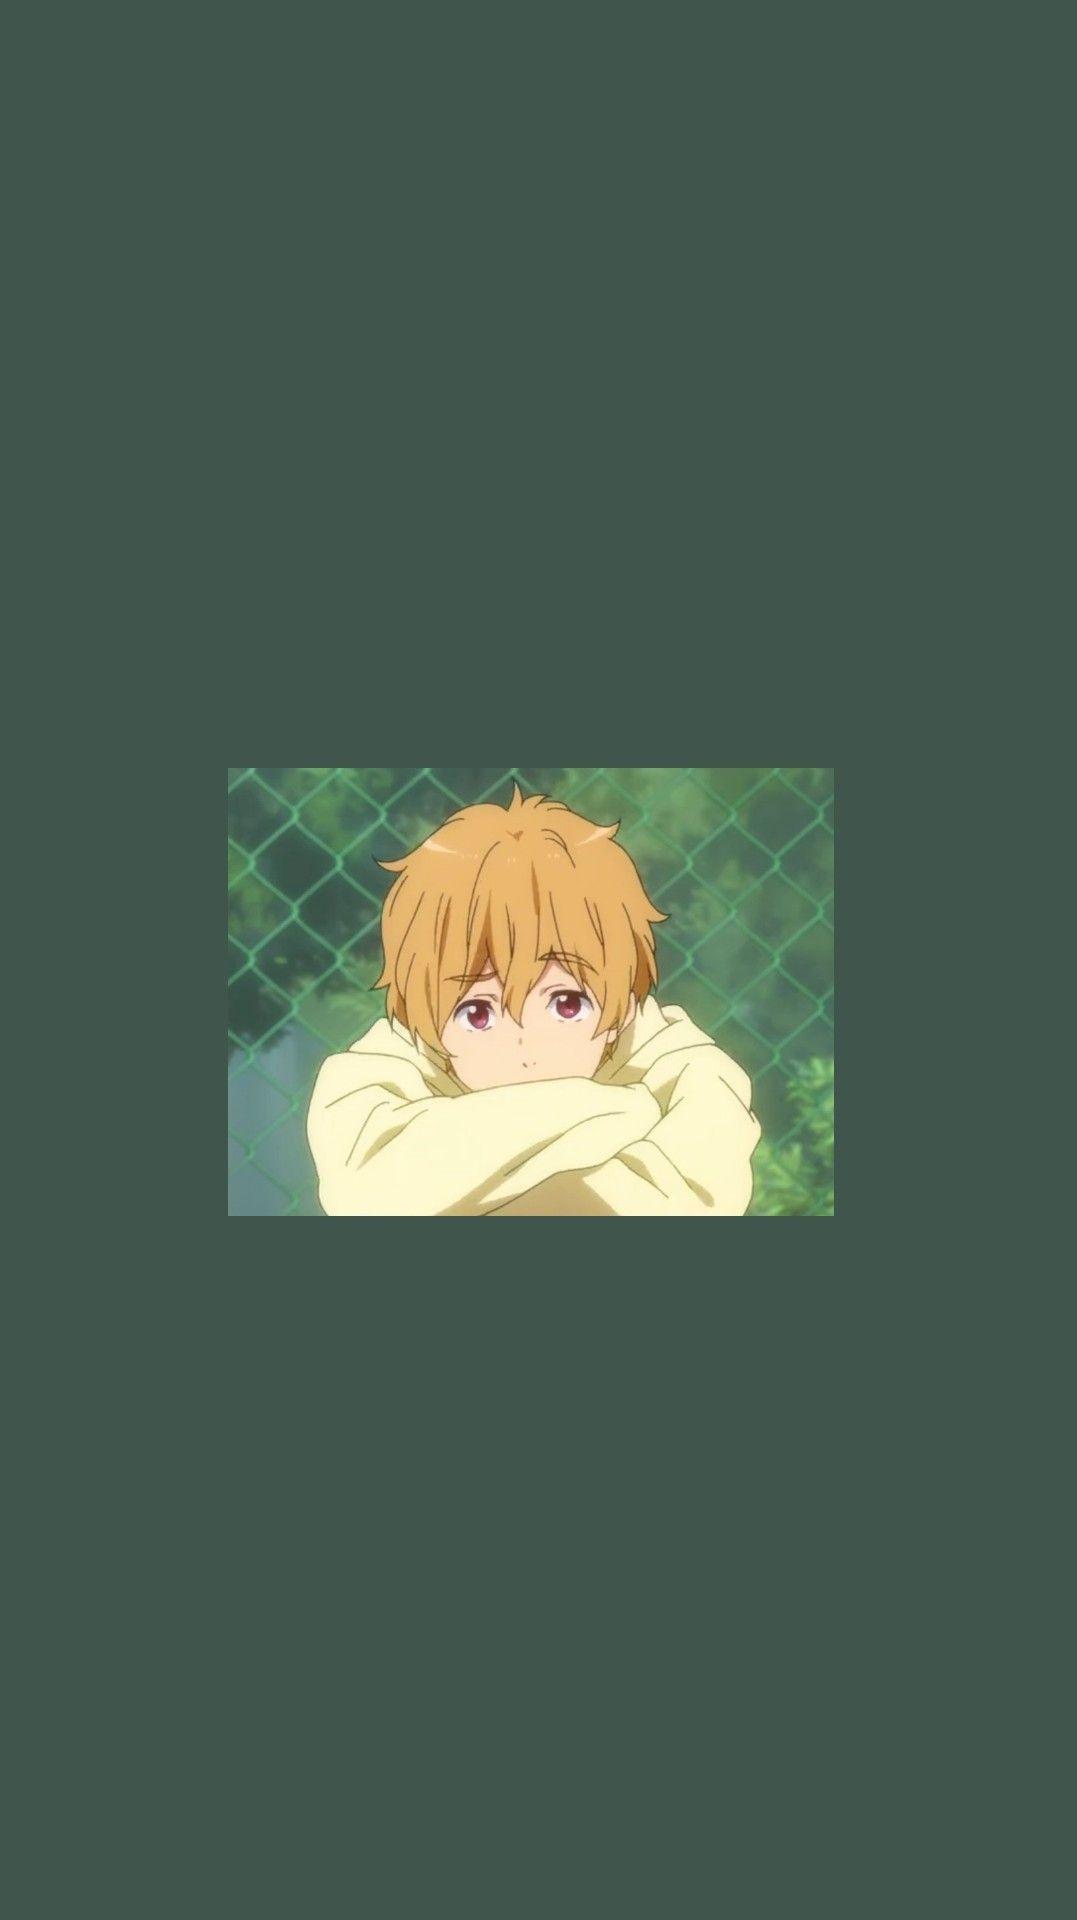 Lemonmxlk Free Iwatobi Swim Club Wallpaper Lockscreen Like In 2020 Anime Wallpaper Iphone Free Anime Kawaii Anime